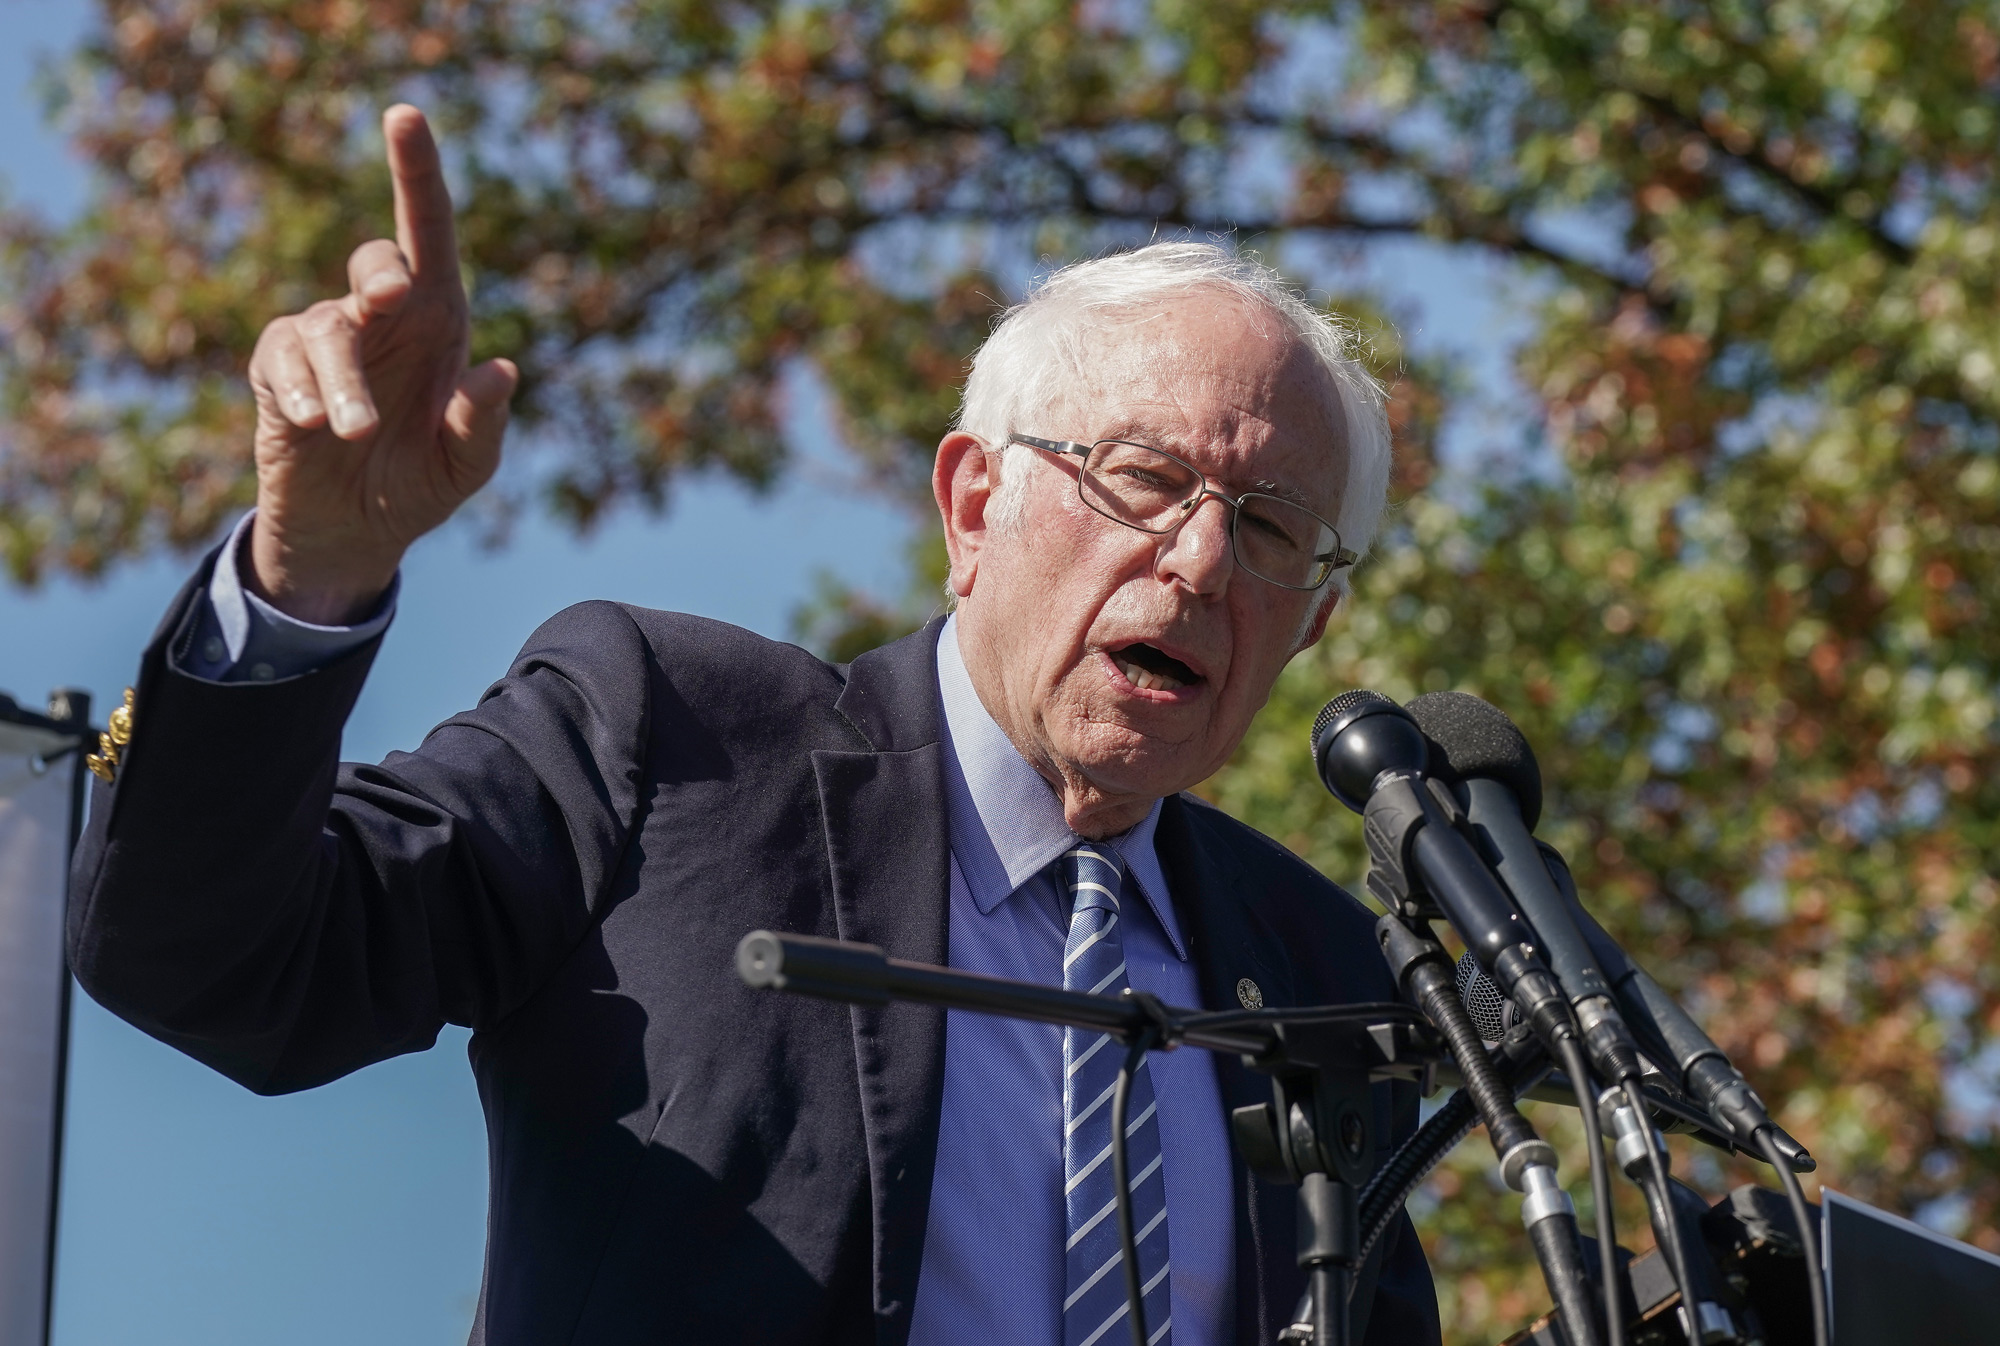 U.S. Senator Bernie Sanders speaks at a protest at the U.S. Capitol on October 22 in Washington, DC.